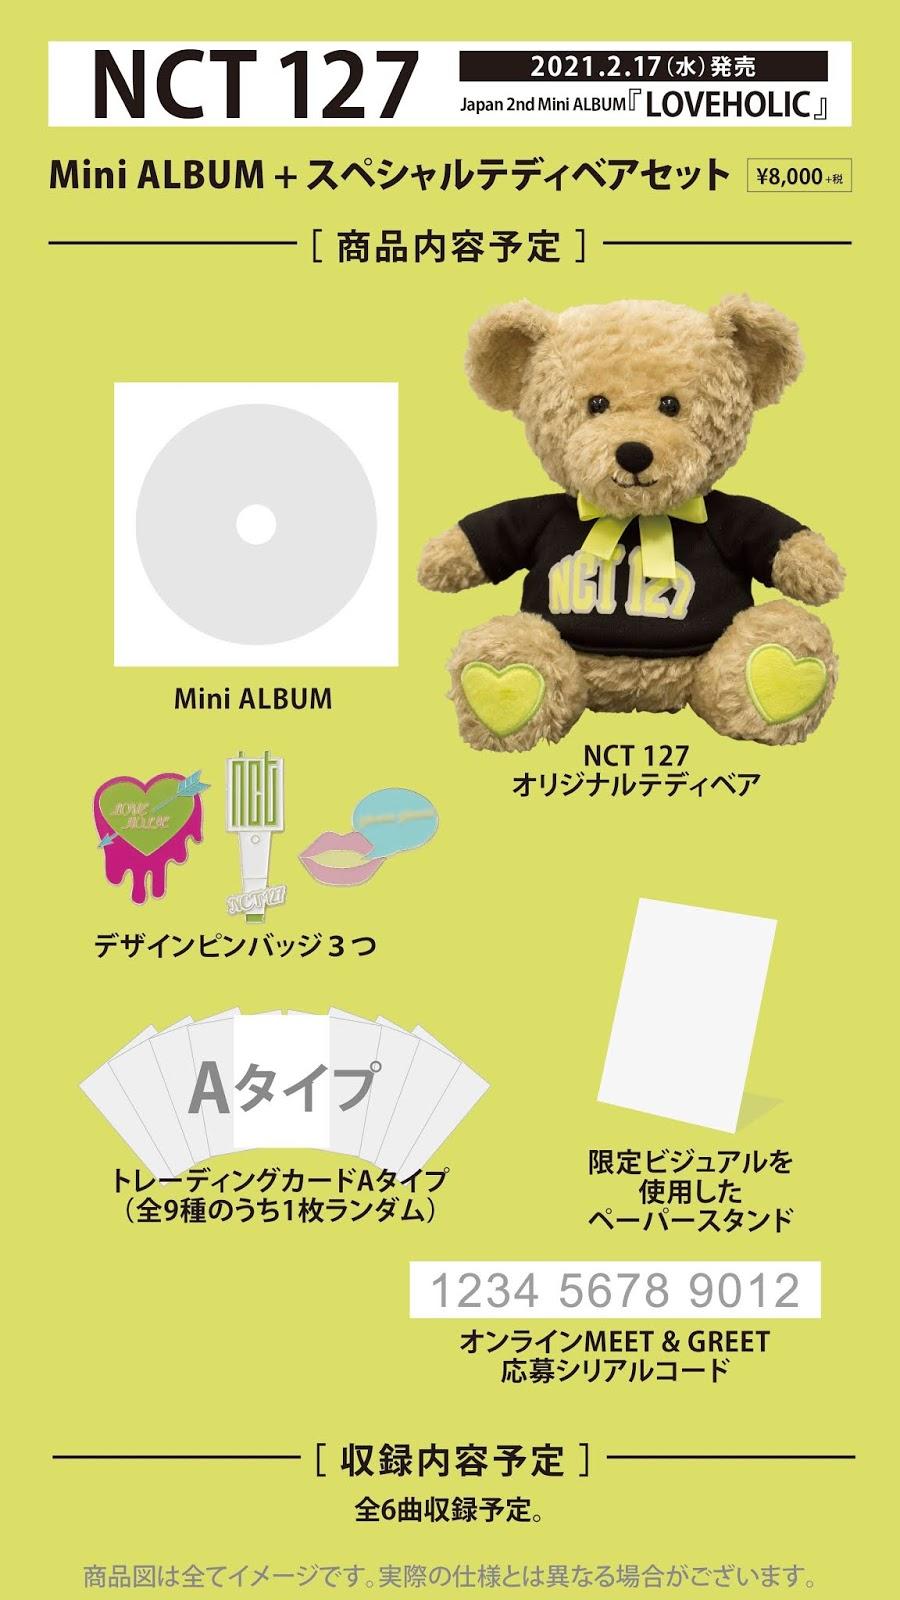 nct 127 japon comeback loveholic